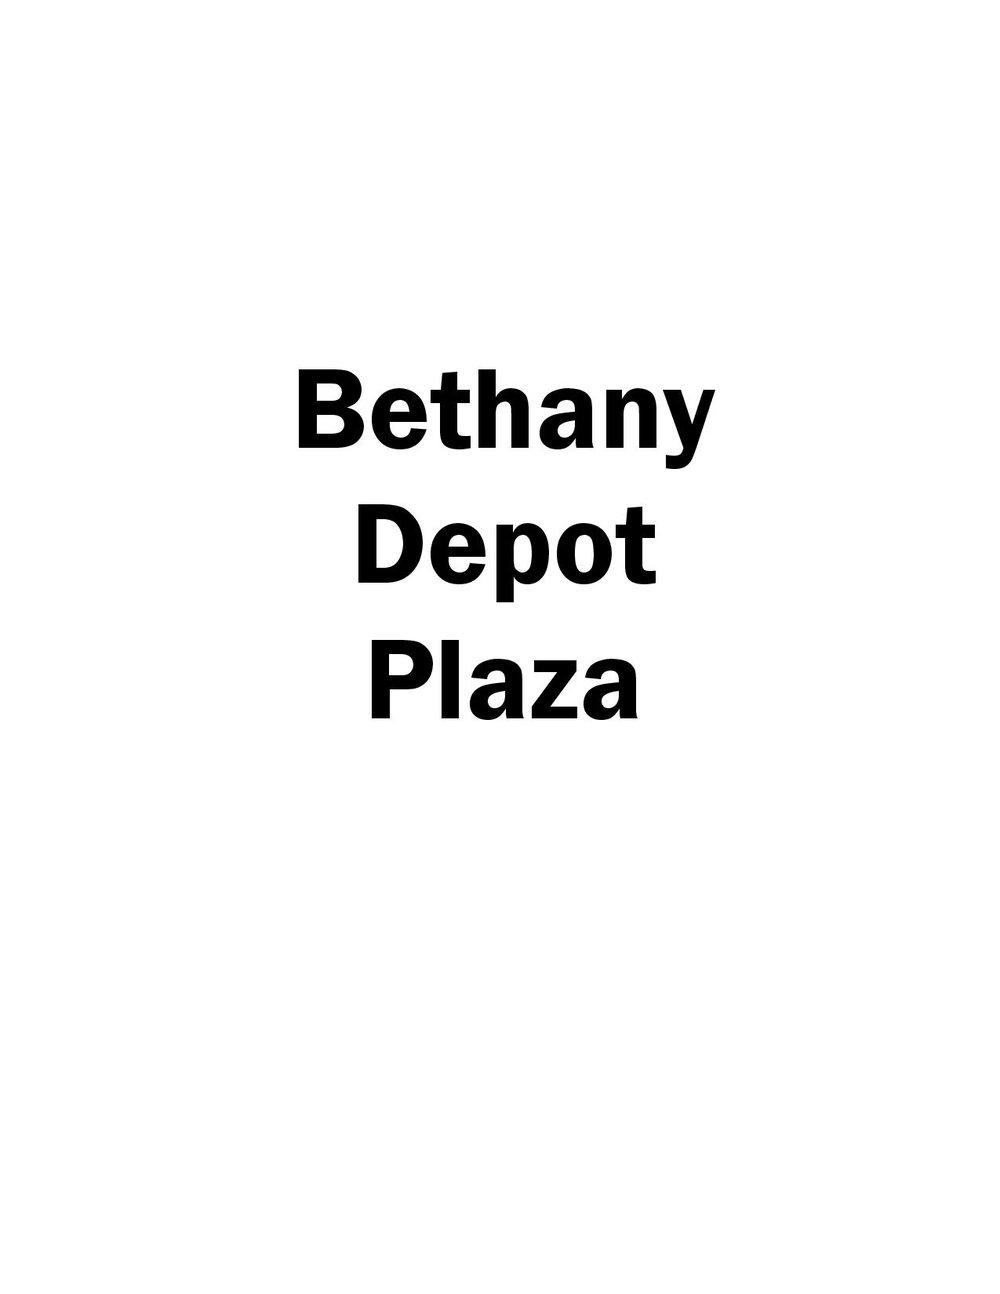 Bethany Depot Plaza Final 2-25-14-page-001.jpg